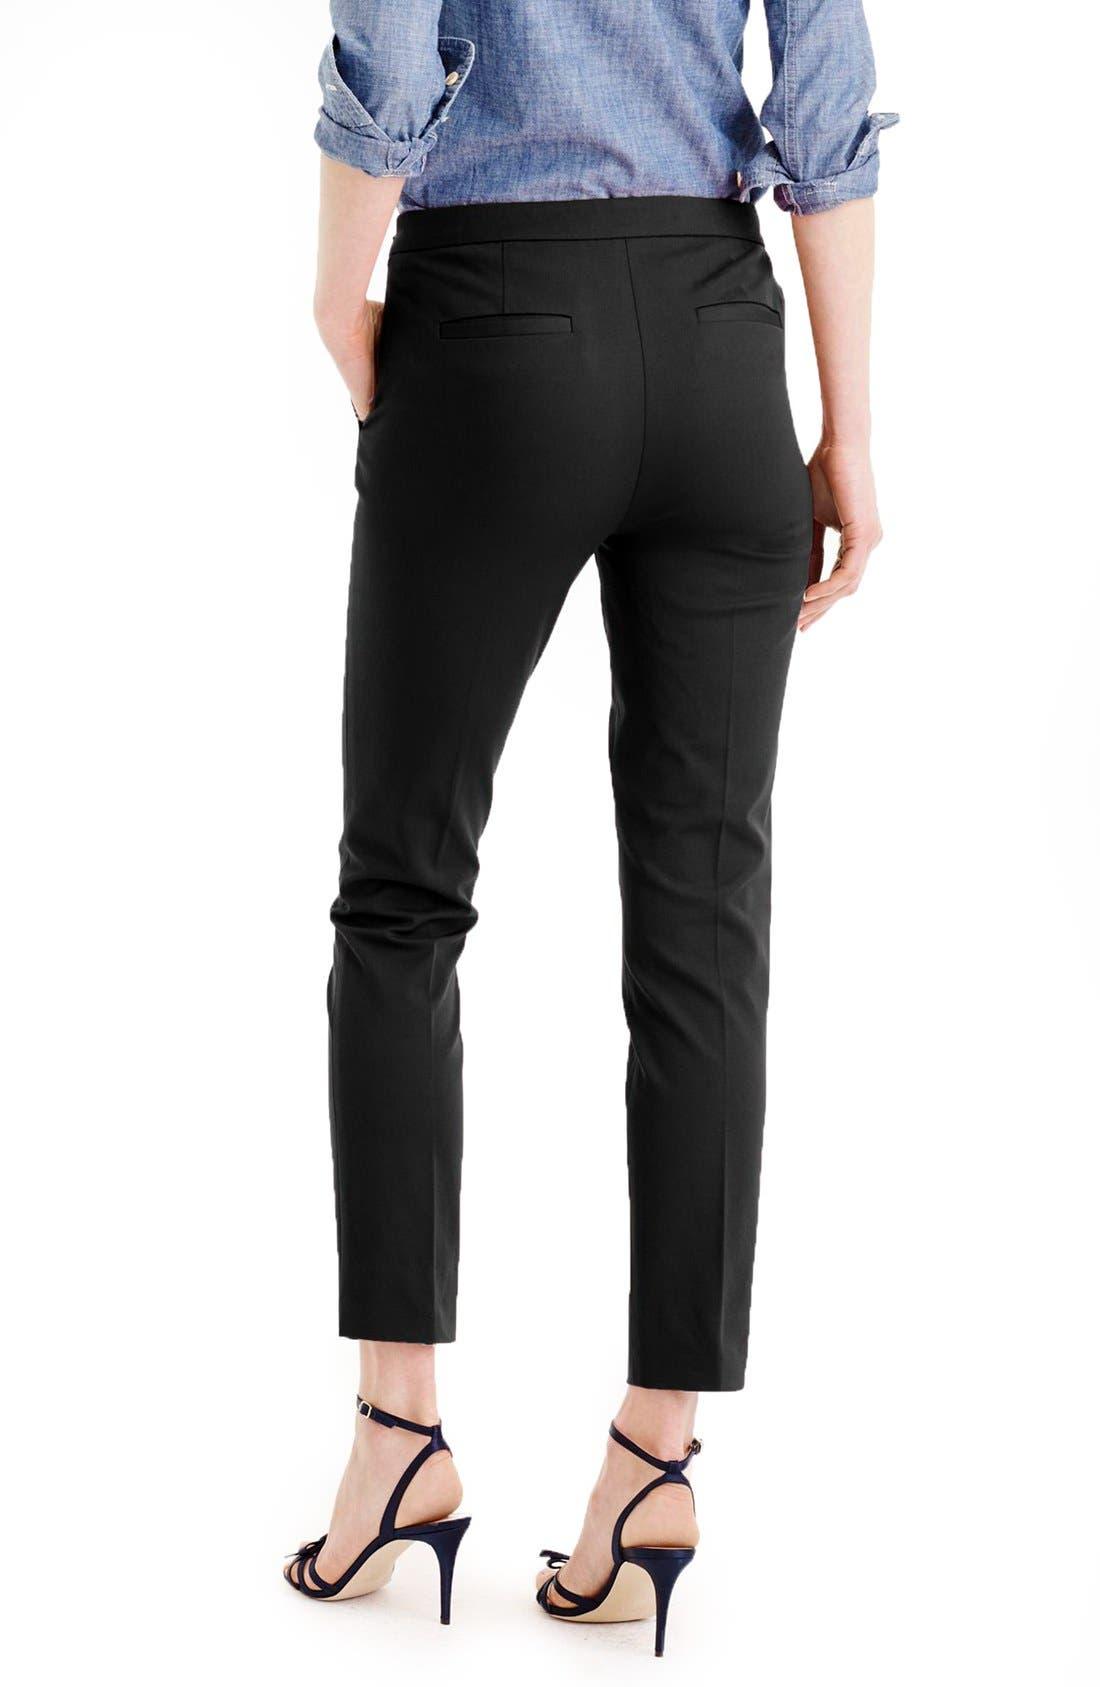 Alternate Image 2  - J.Crew 'Martie' Bi-Stretch Cotton Blend Pants (Regular & Petite)